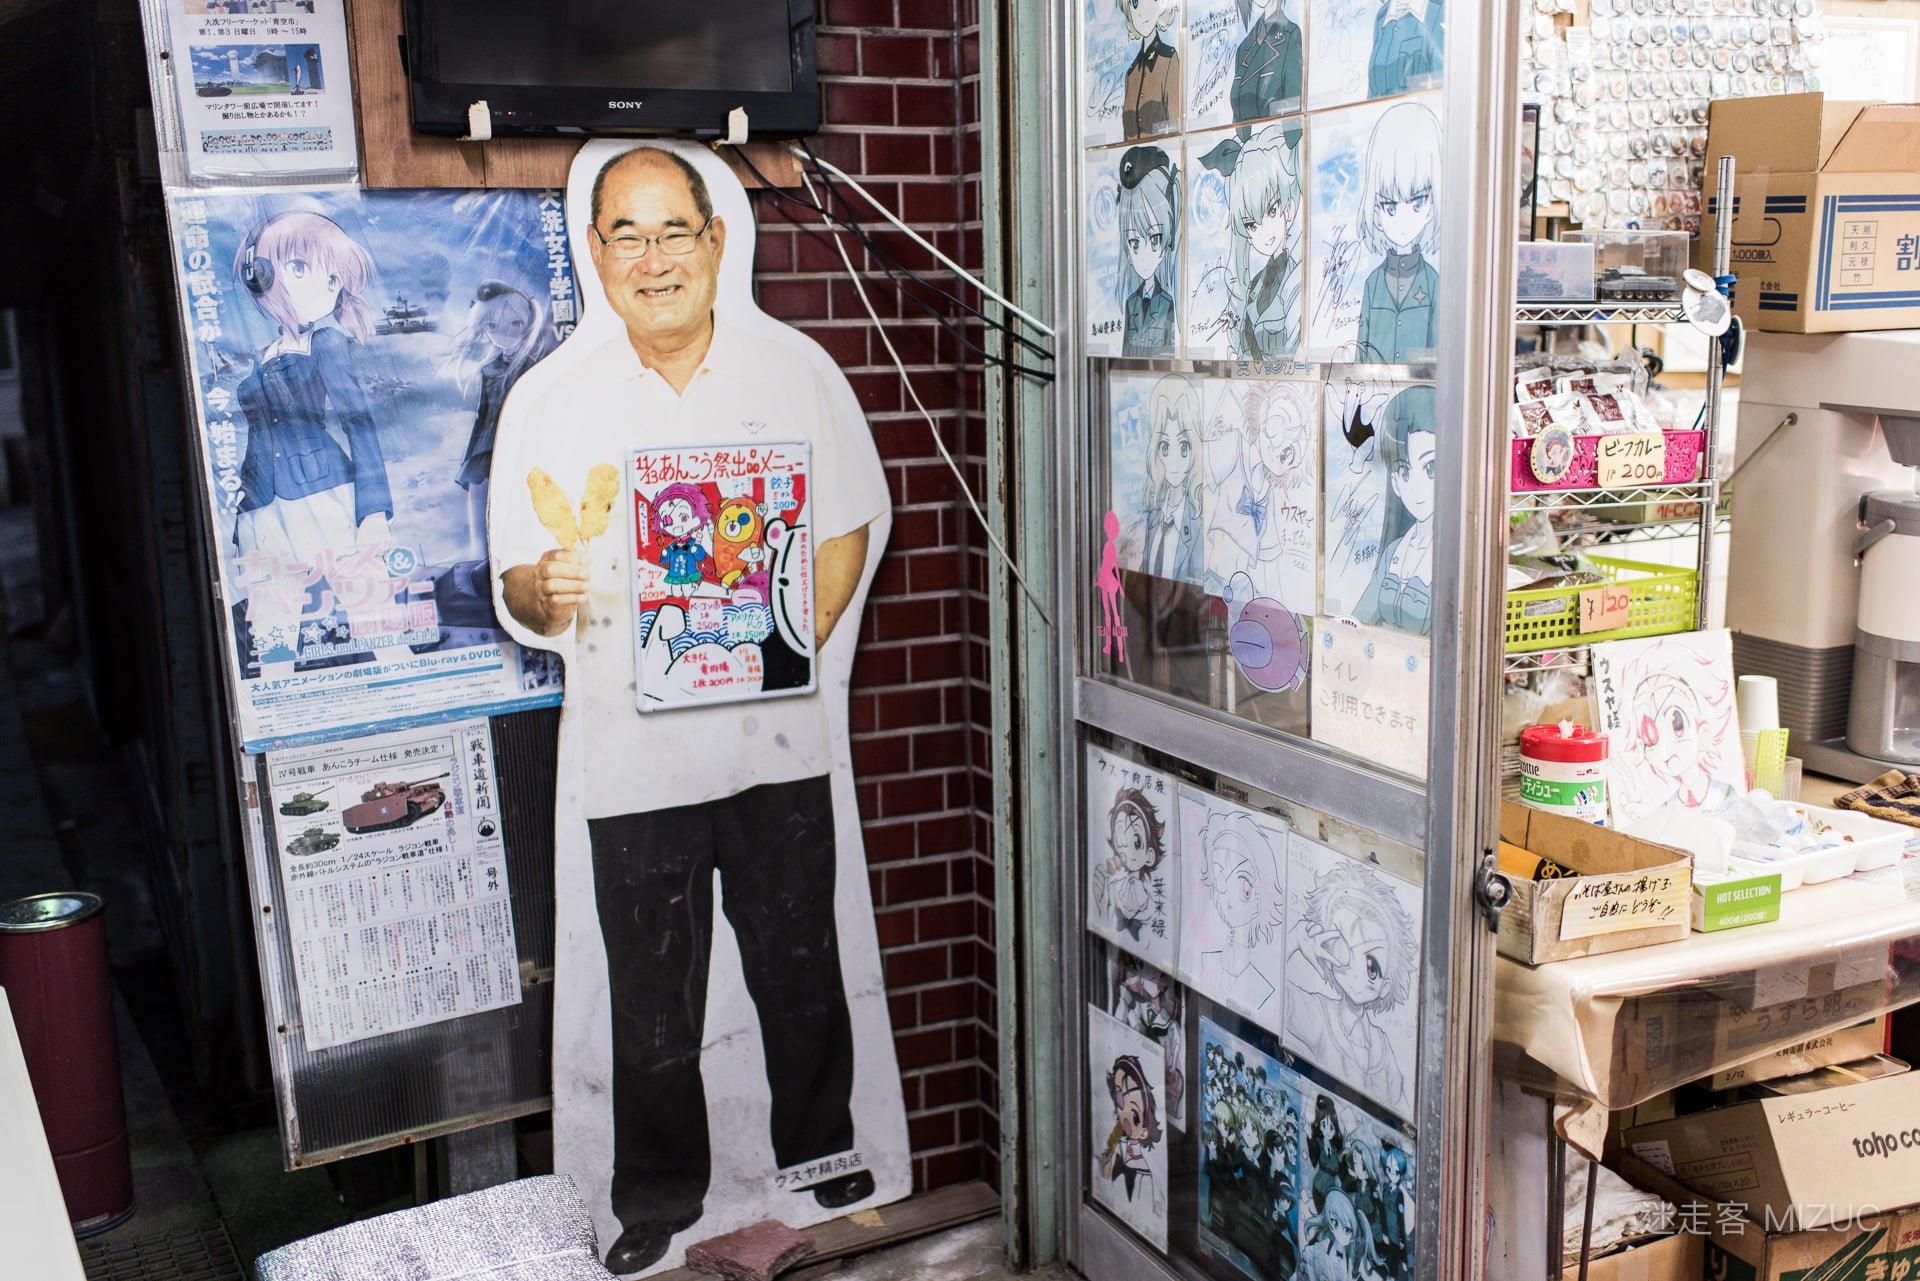 201711 Ibaraki Tochigi Gunma Japan Travel By RentalCar 9 日本自駕旅遊/北關東三縣「茨城、櫪木、群馬」秋天美食、溫泉與瀑布秘境百景(精選照片分享)